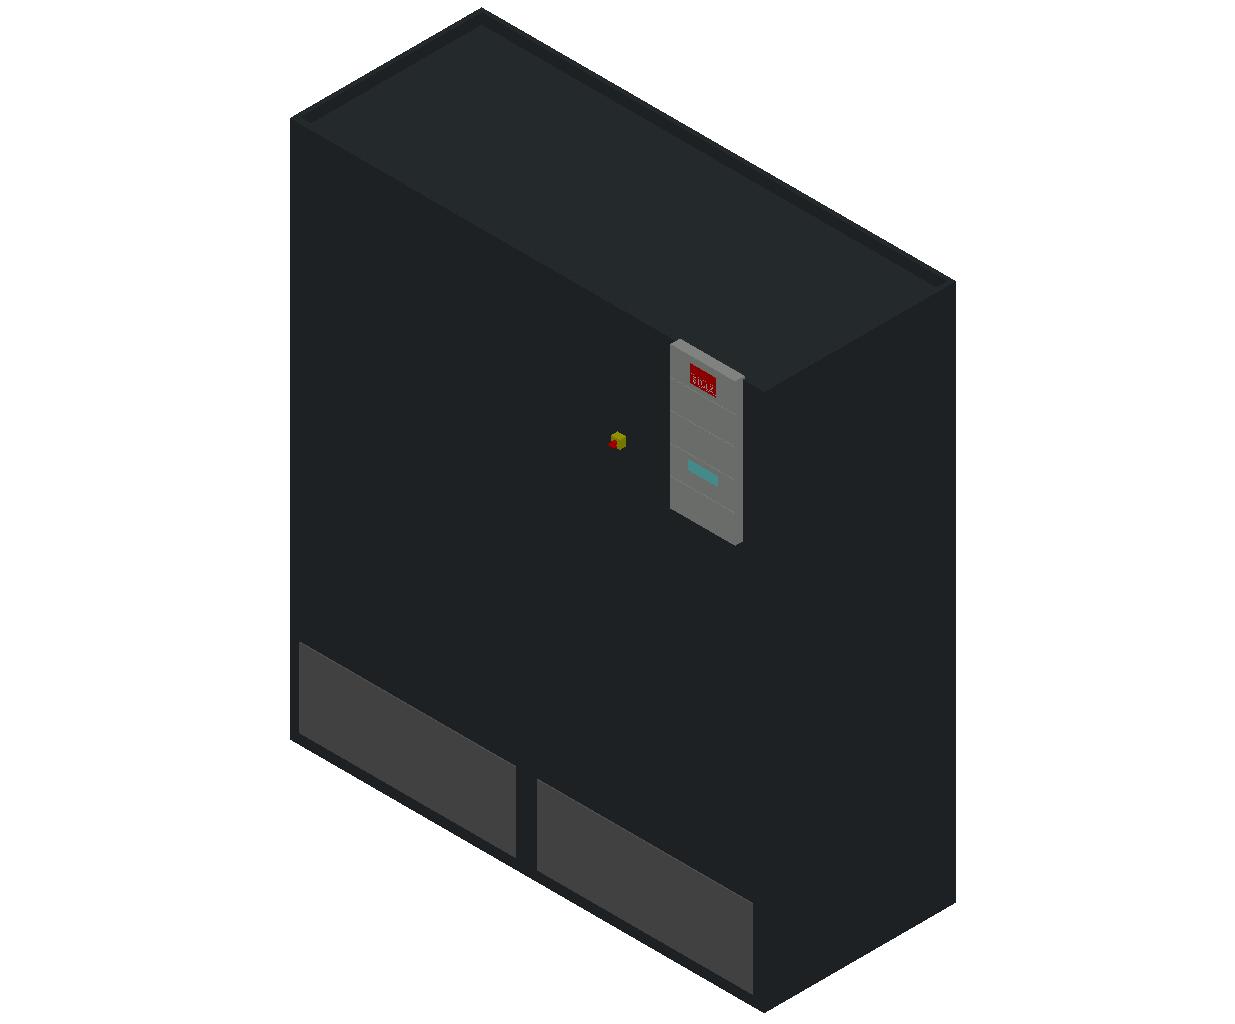 HC_Air Conditioner_Indoor Unit_MEPcontent_STULZ_CyberAir 3PRO_ALR_Dual Circuit GES_ALR_542_GES_INT-EN.dwg